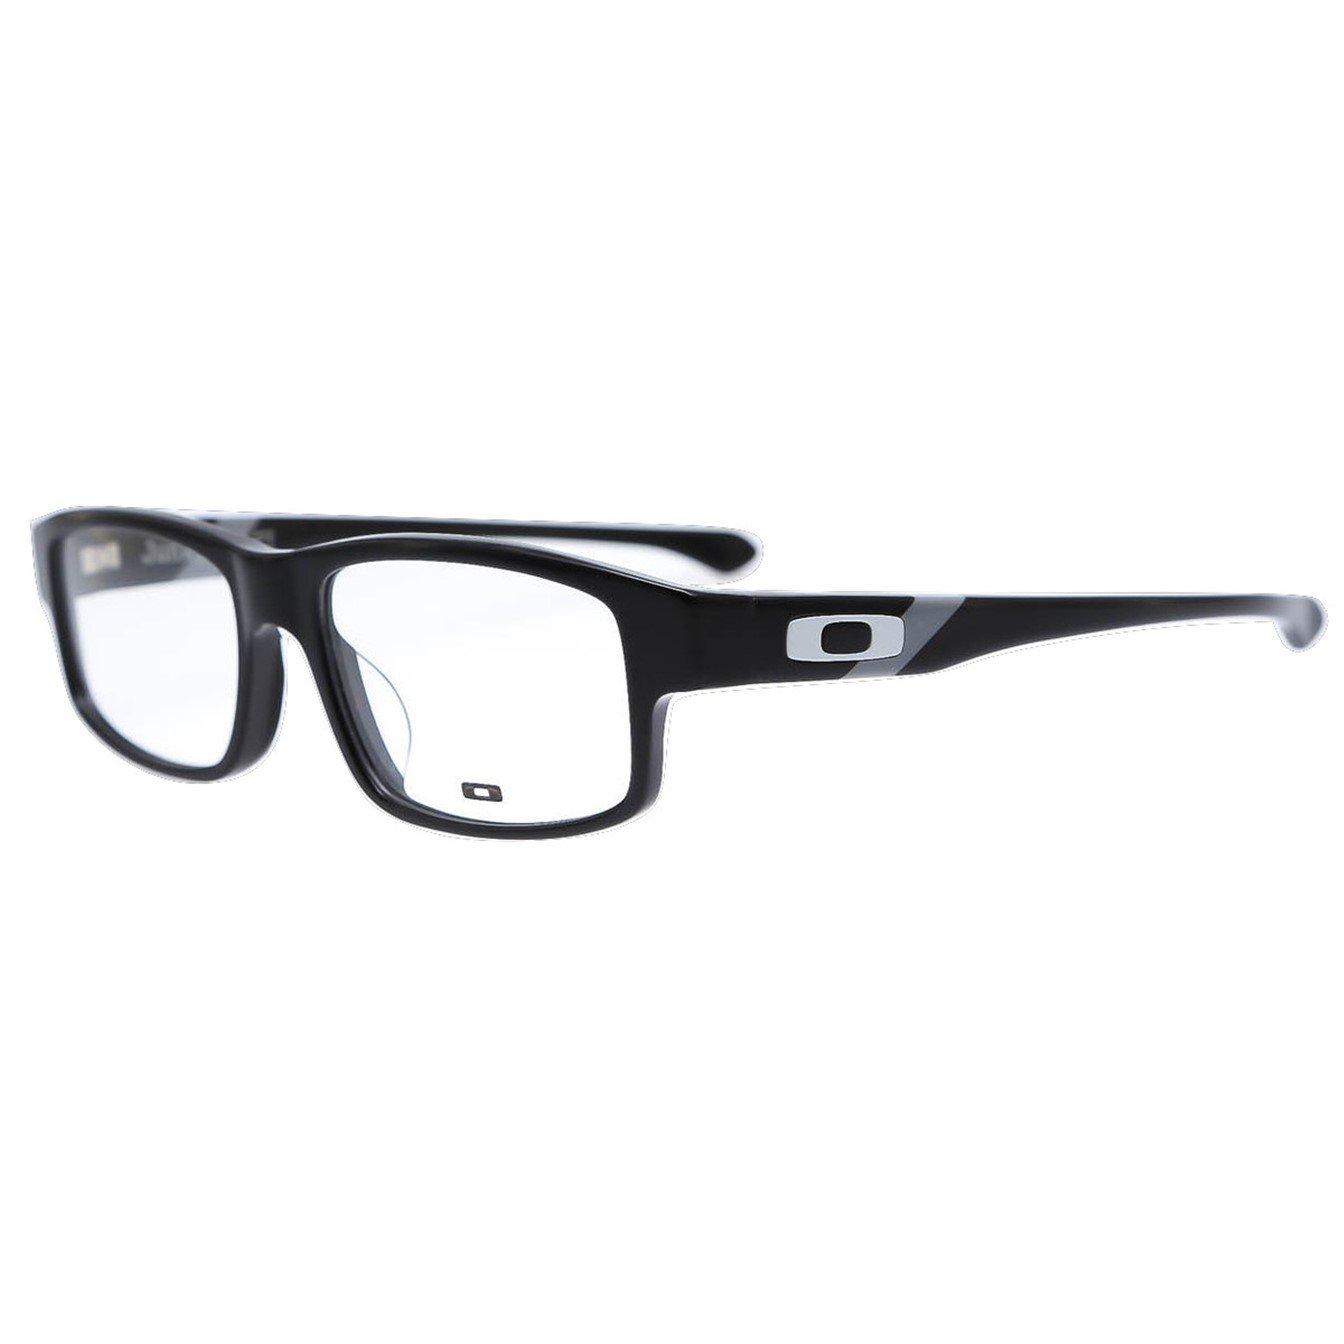 Oakley Asia Fit Junkyard II Precription Eye Glasses - Polished Black/Grey, OX1102-0453